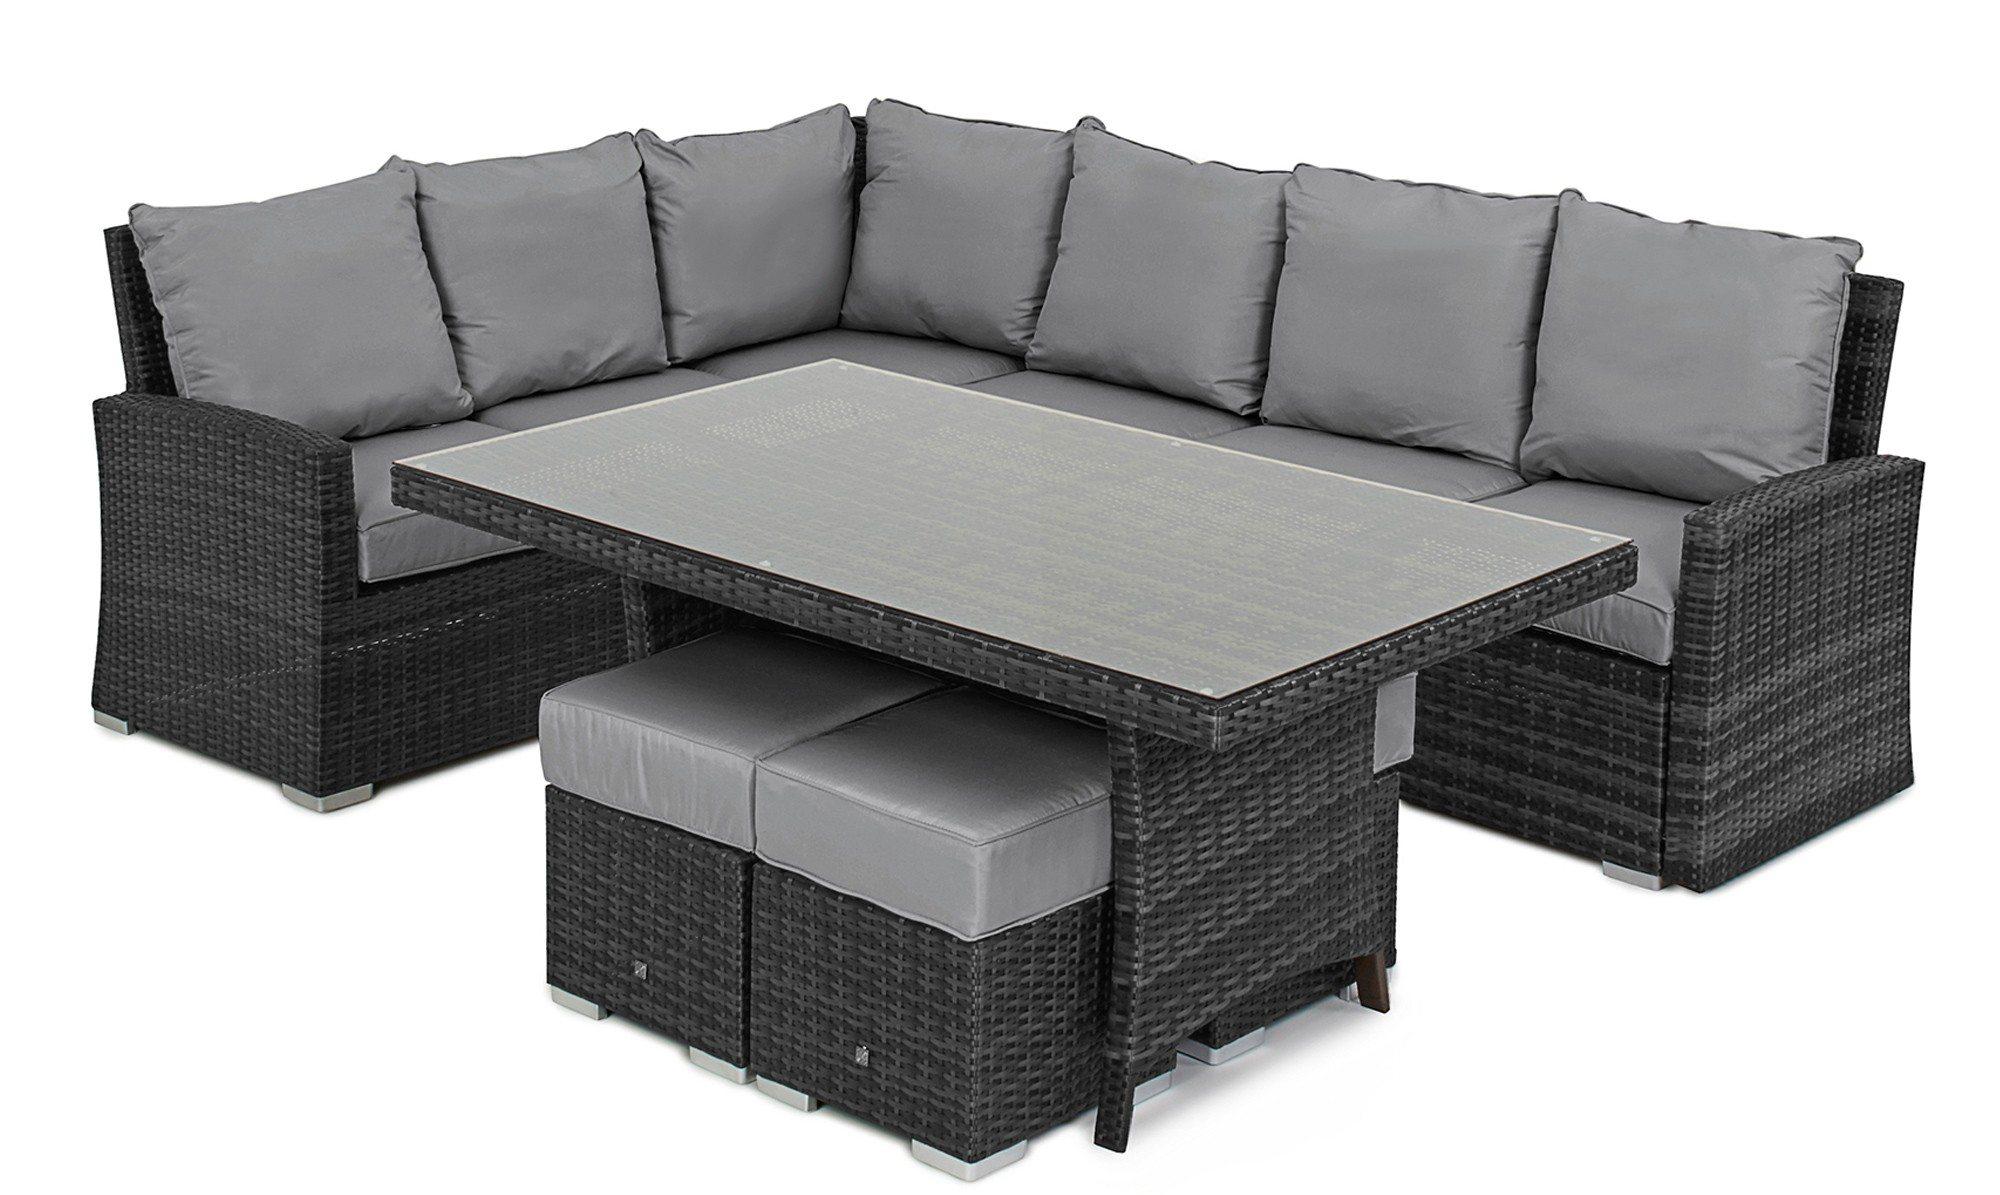 well furnir corner sofa dining table rattan garden set. Black Bedroom Furniture Sets. Home Design Ideas